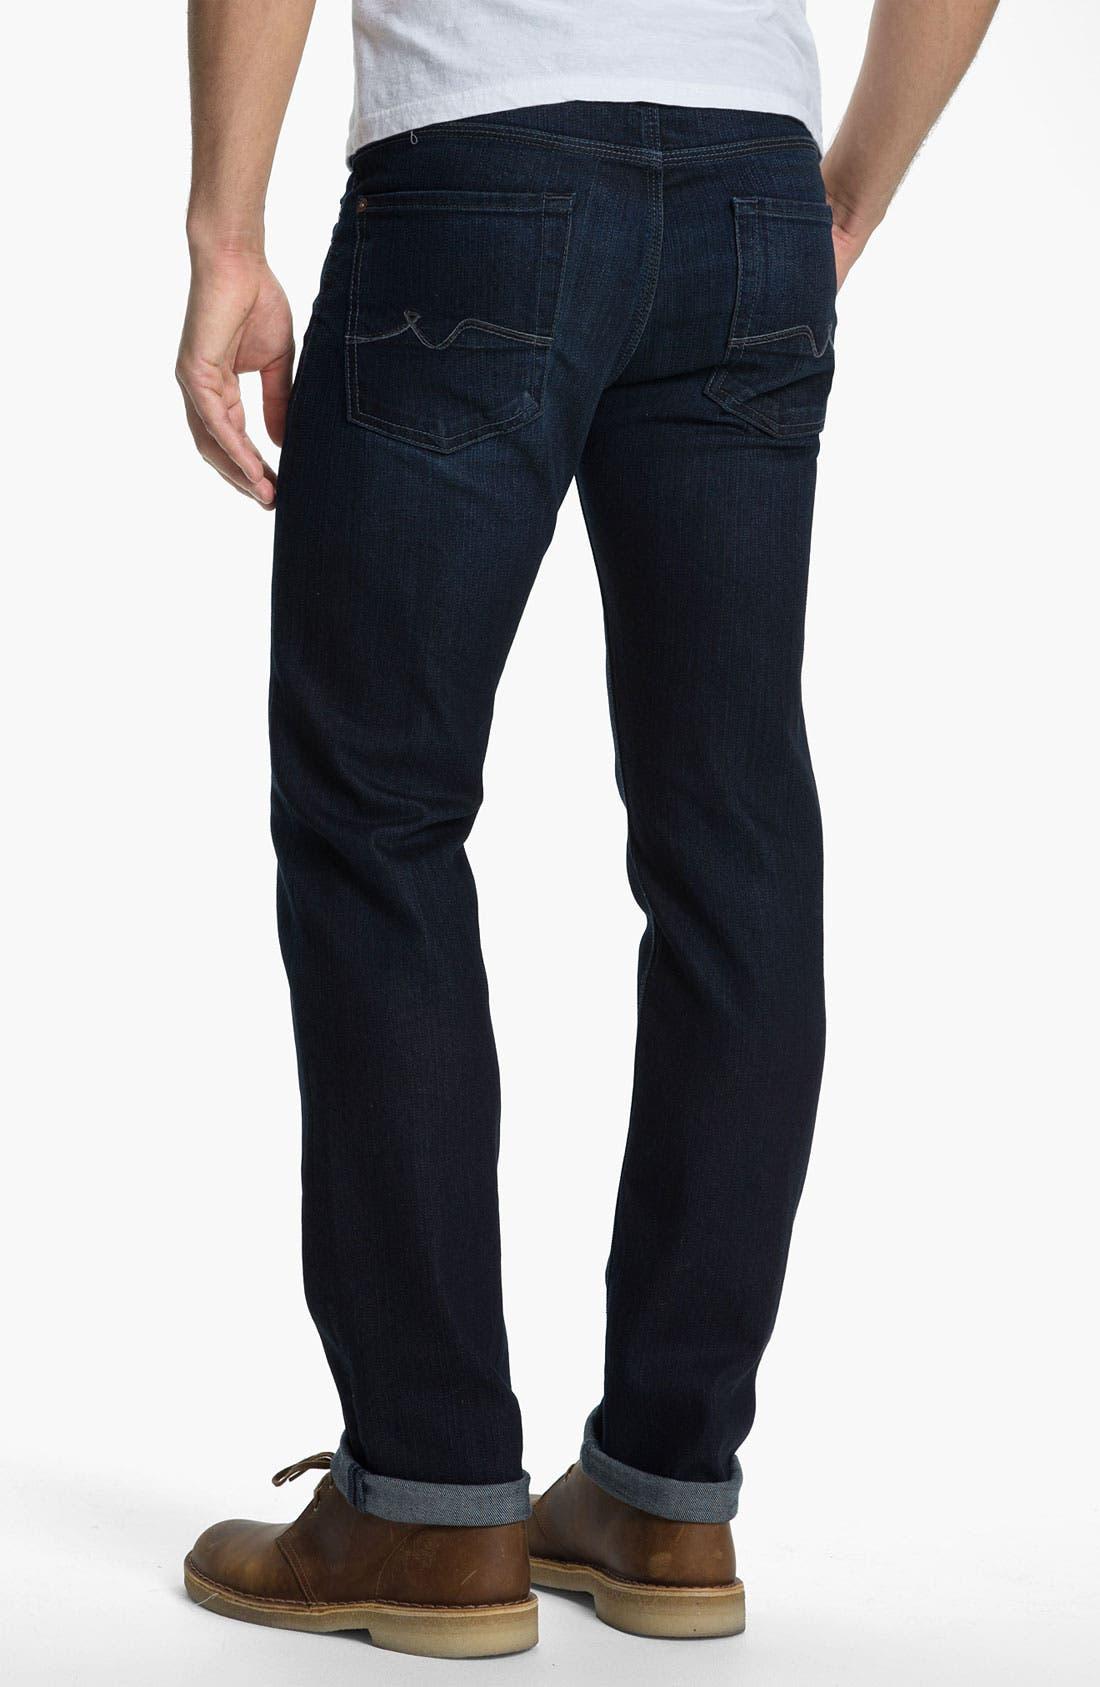 Main Image - 7 For All Mankind 'Slimmy' Slim Straight Leg Jeans (Bodega Bay)